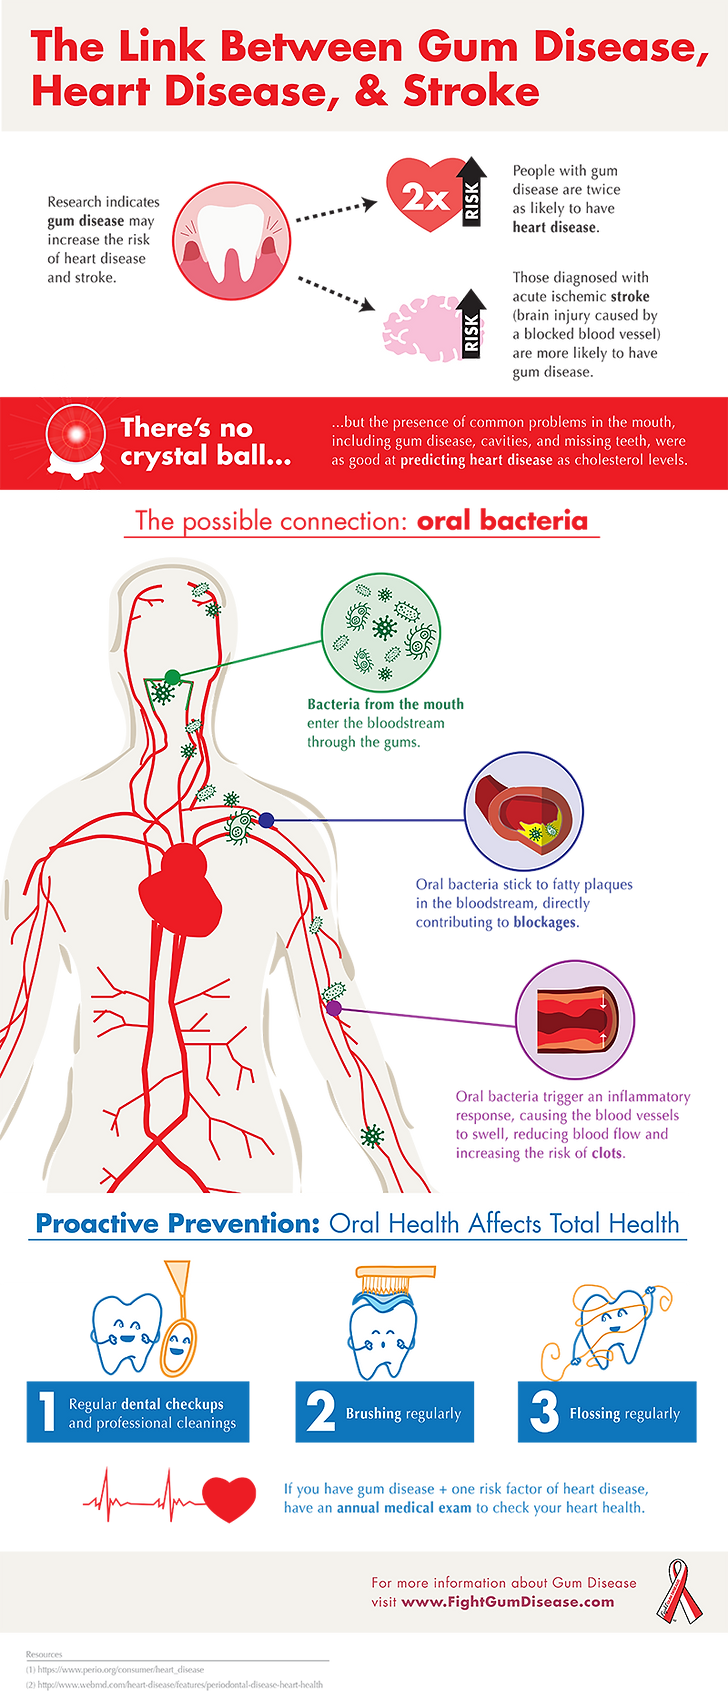 infographic-gum-disease-heart-disease-st